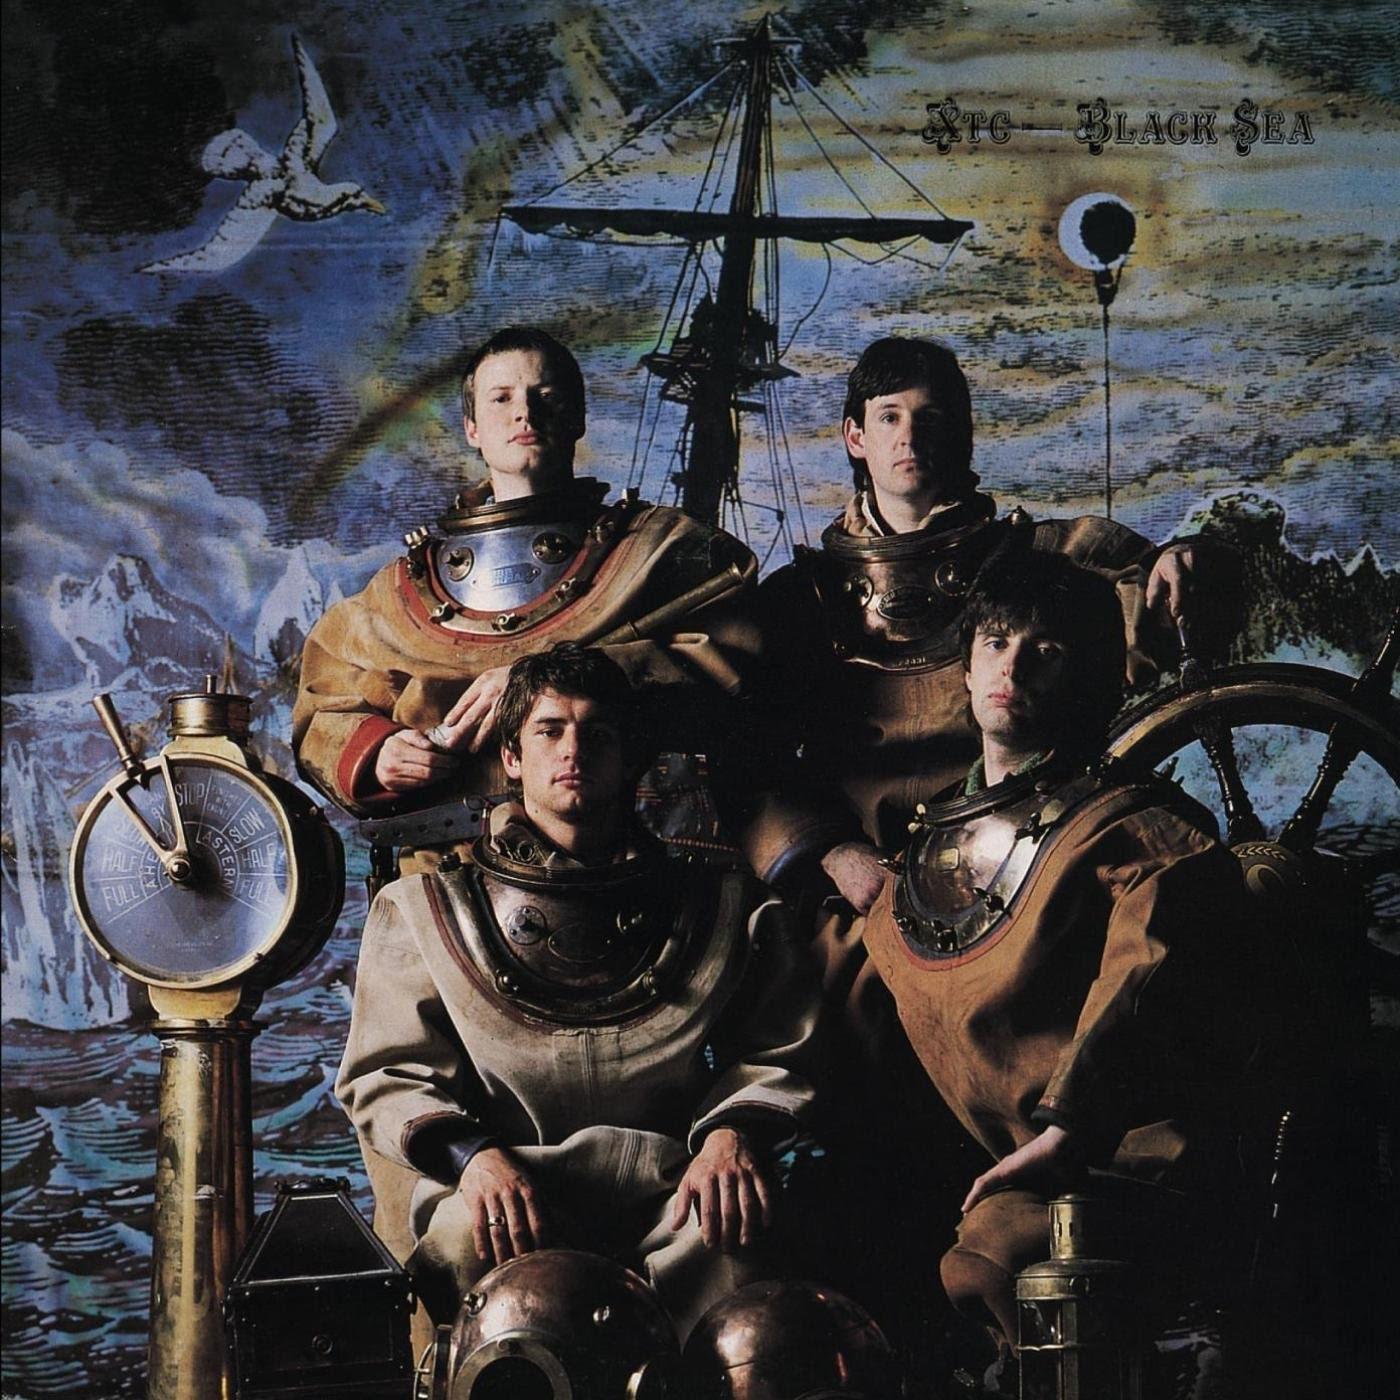 XTC – Black Sea [LP]